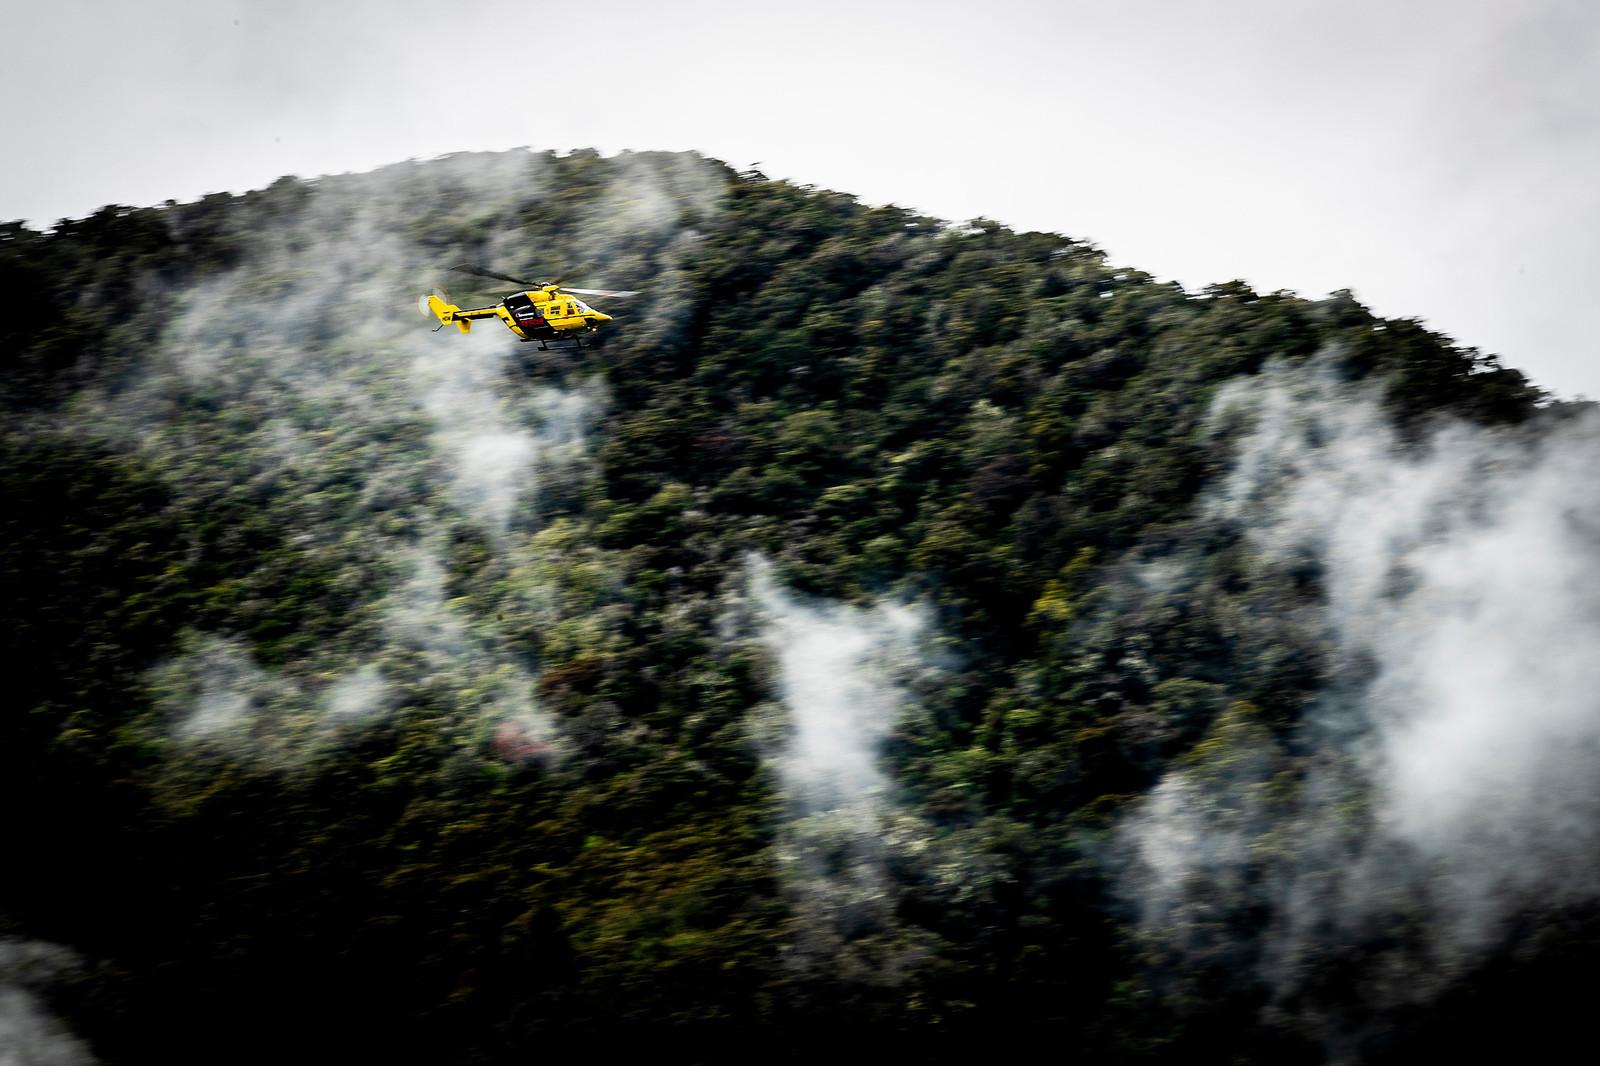 NZEnduro19  m1 8696 - 2019 NZ Enduro Day 2 Photo Gallery - Mountain Biking Pictures - Vital MTB